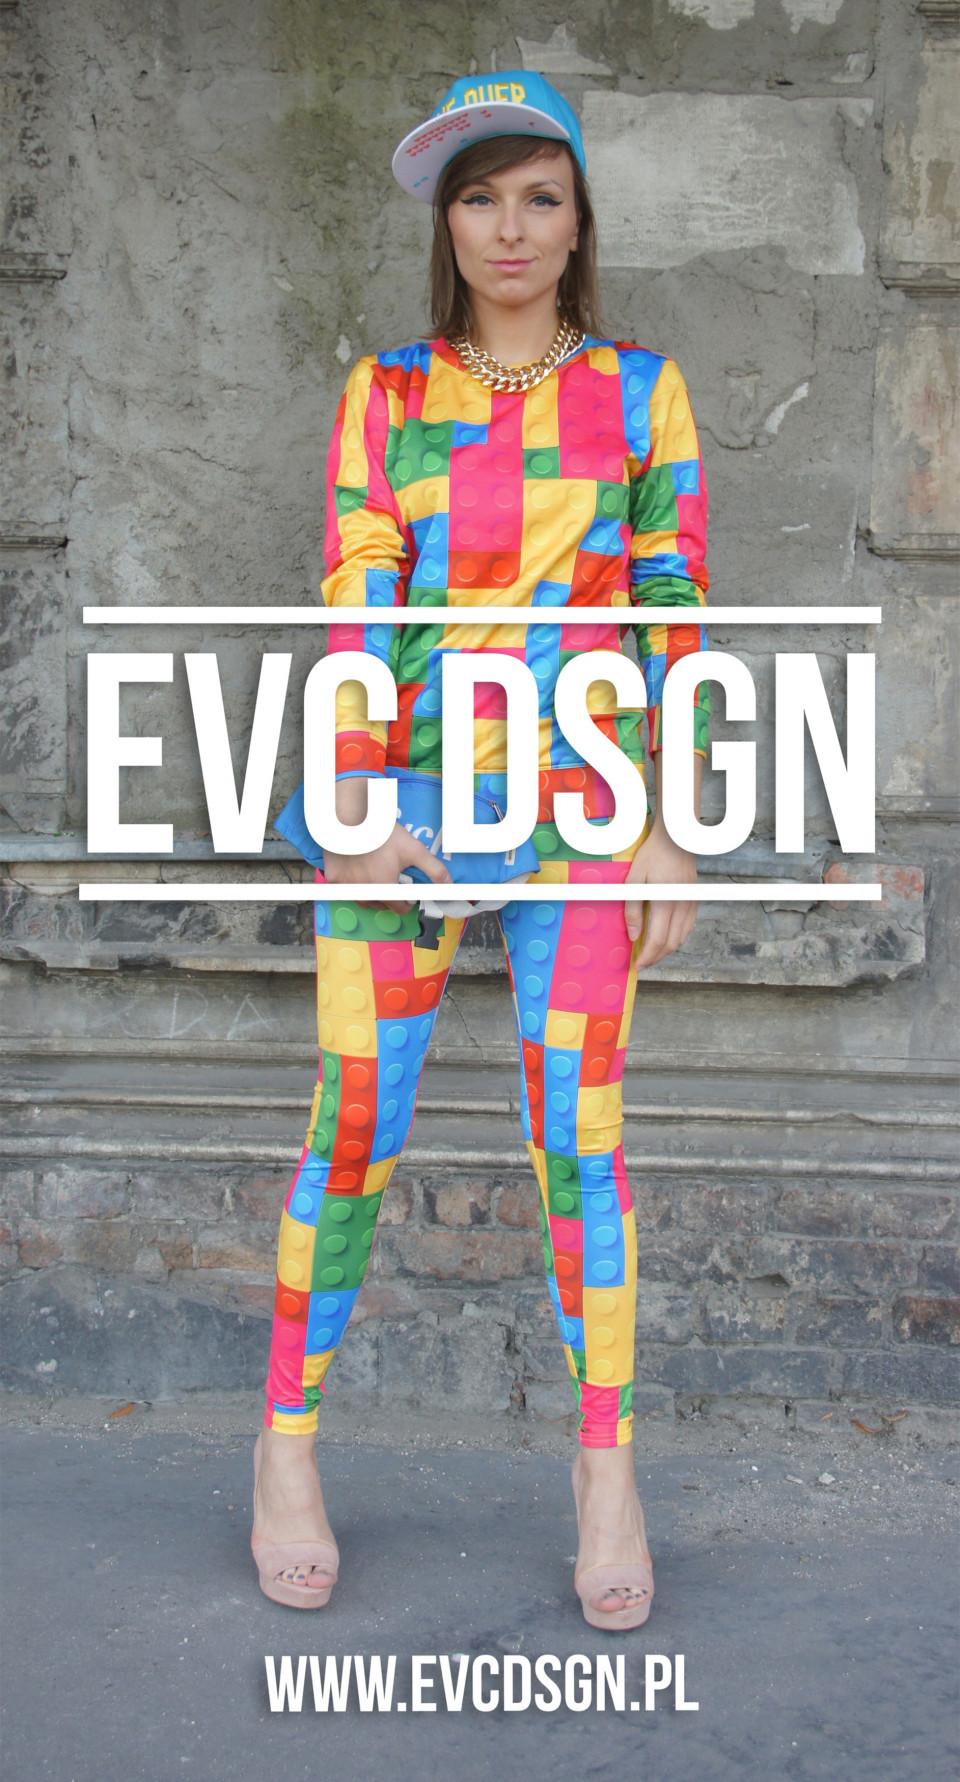 EVC_DSGN_19__00,00_PLN